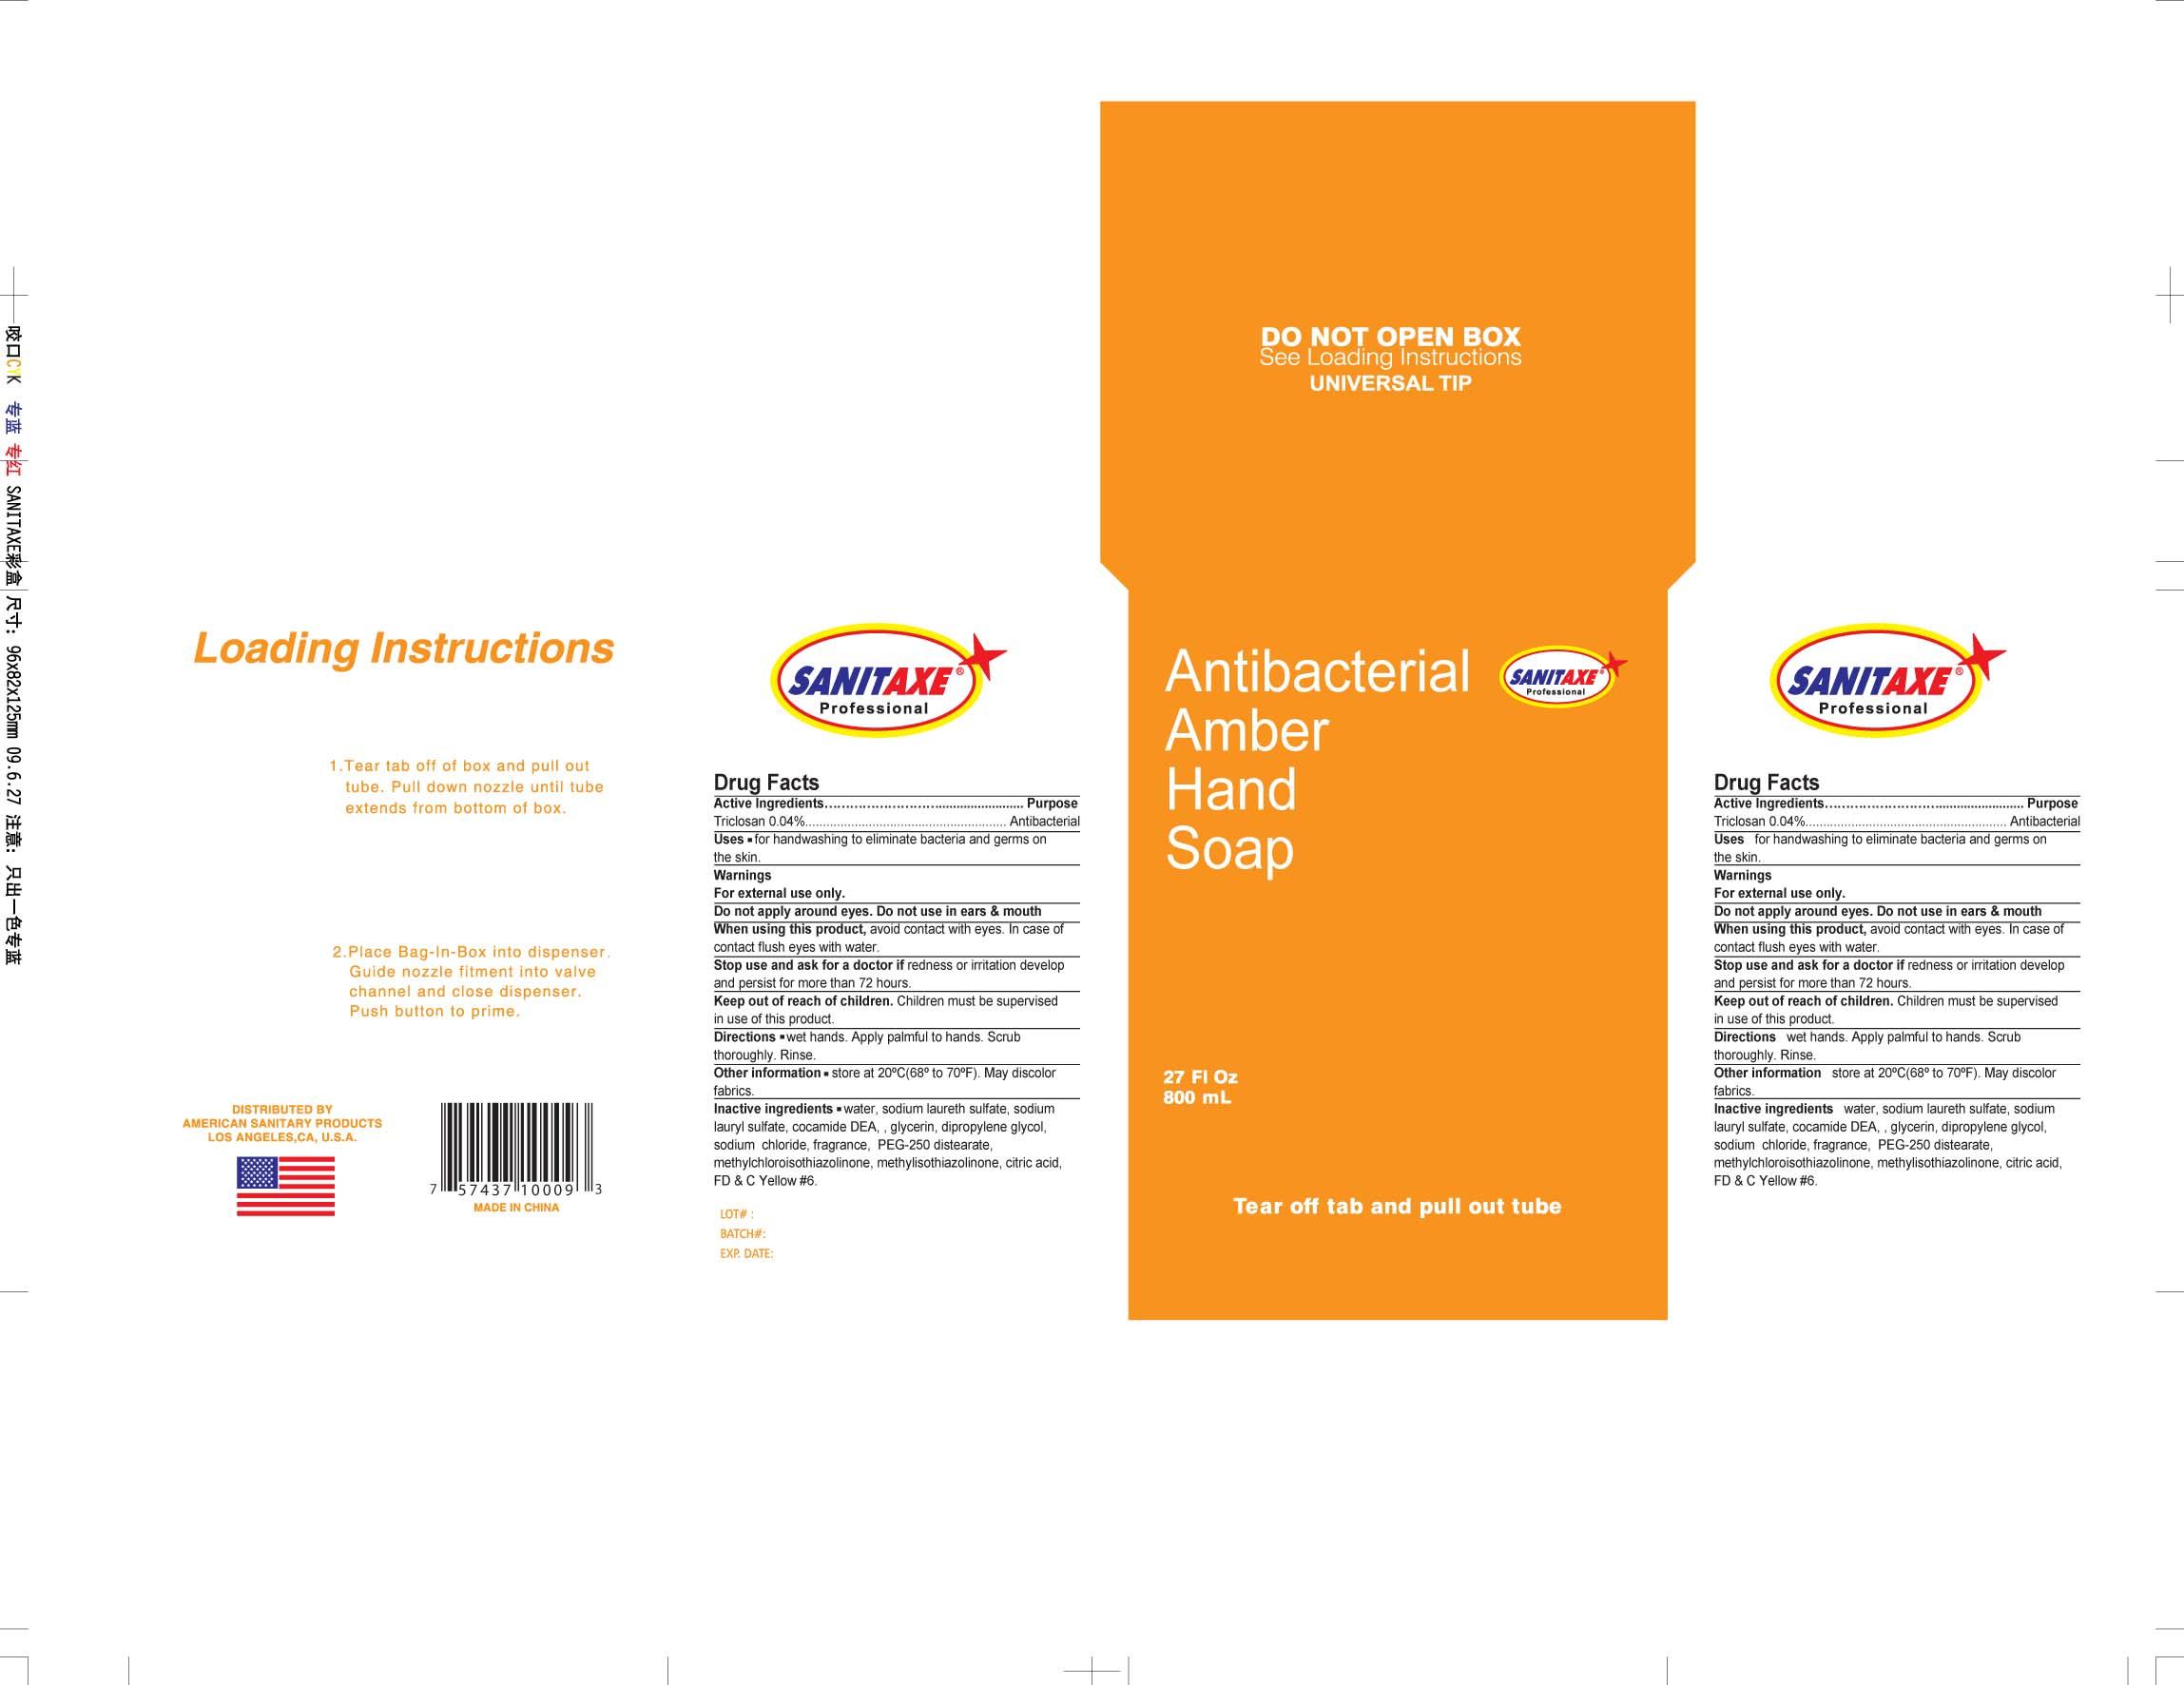 Antibacterial Amber Hand Soap (Triclosan) Liquid [Ningbo United Group Import And Export Co. Ltd.]